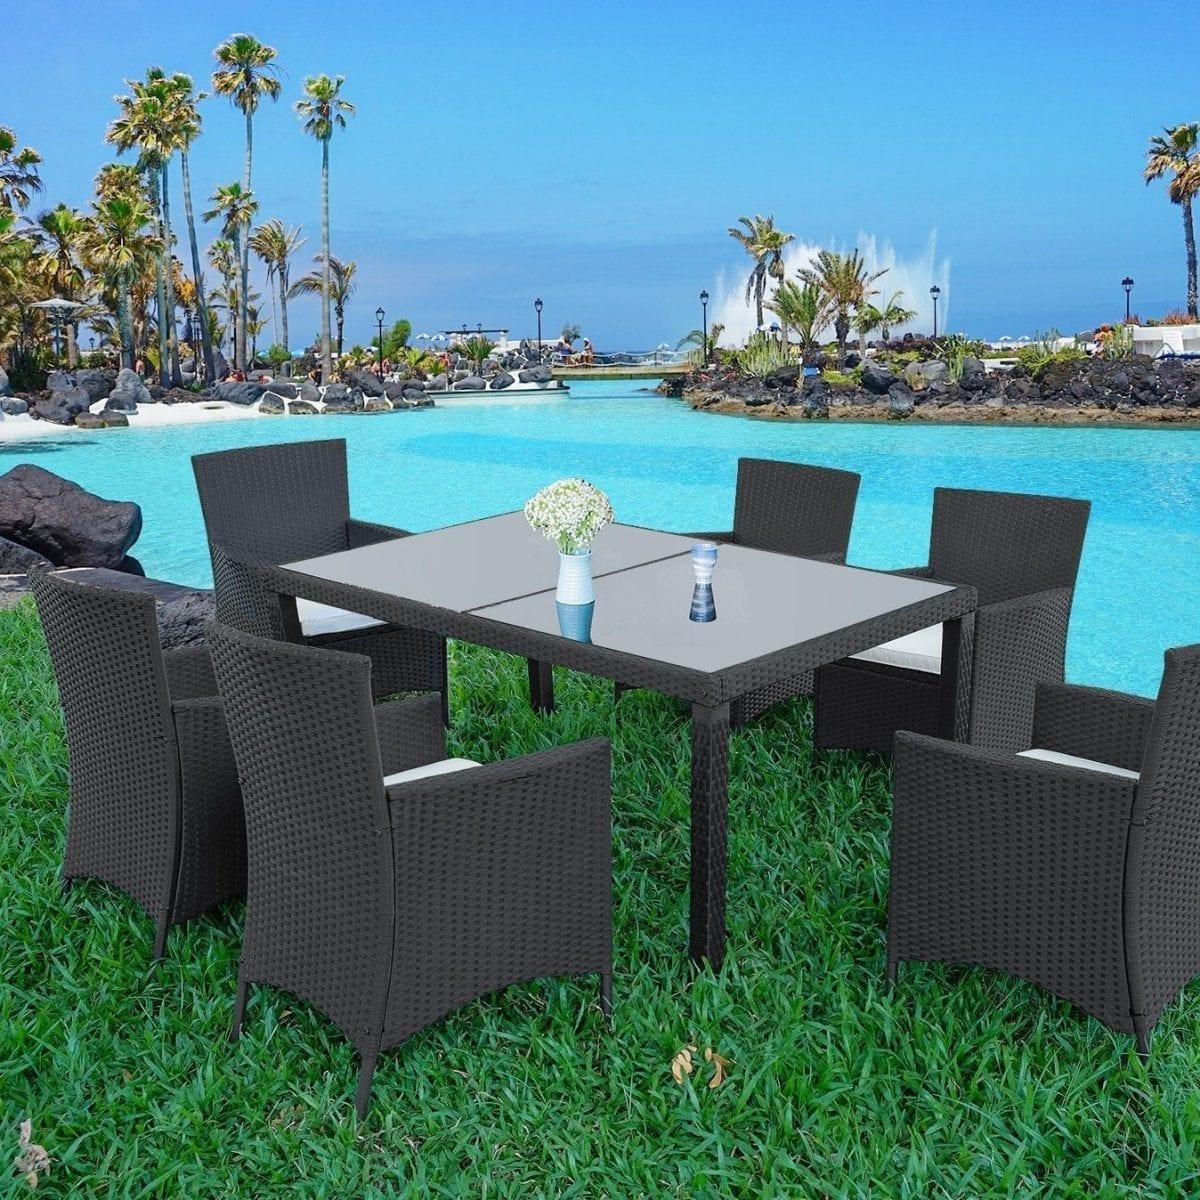 merax-outdoor-wicker-dining-set-4-5 Best Wicker Patio Furniture Sets